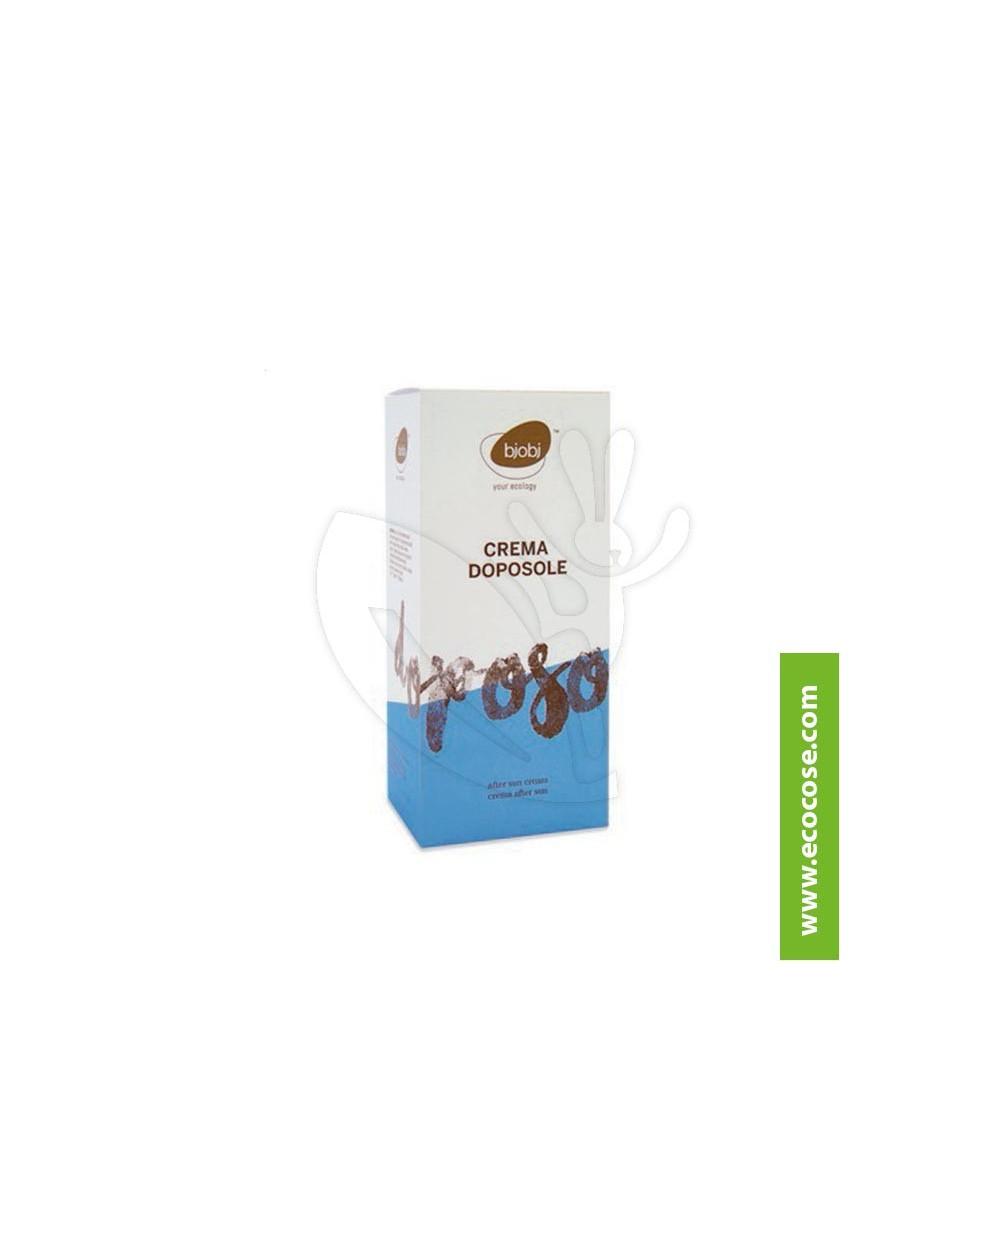 Bjobj - Crema doposole